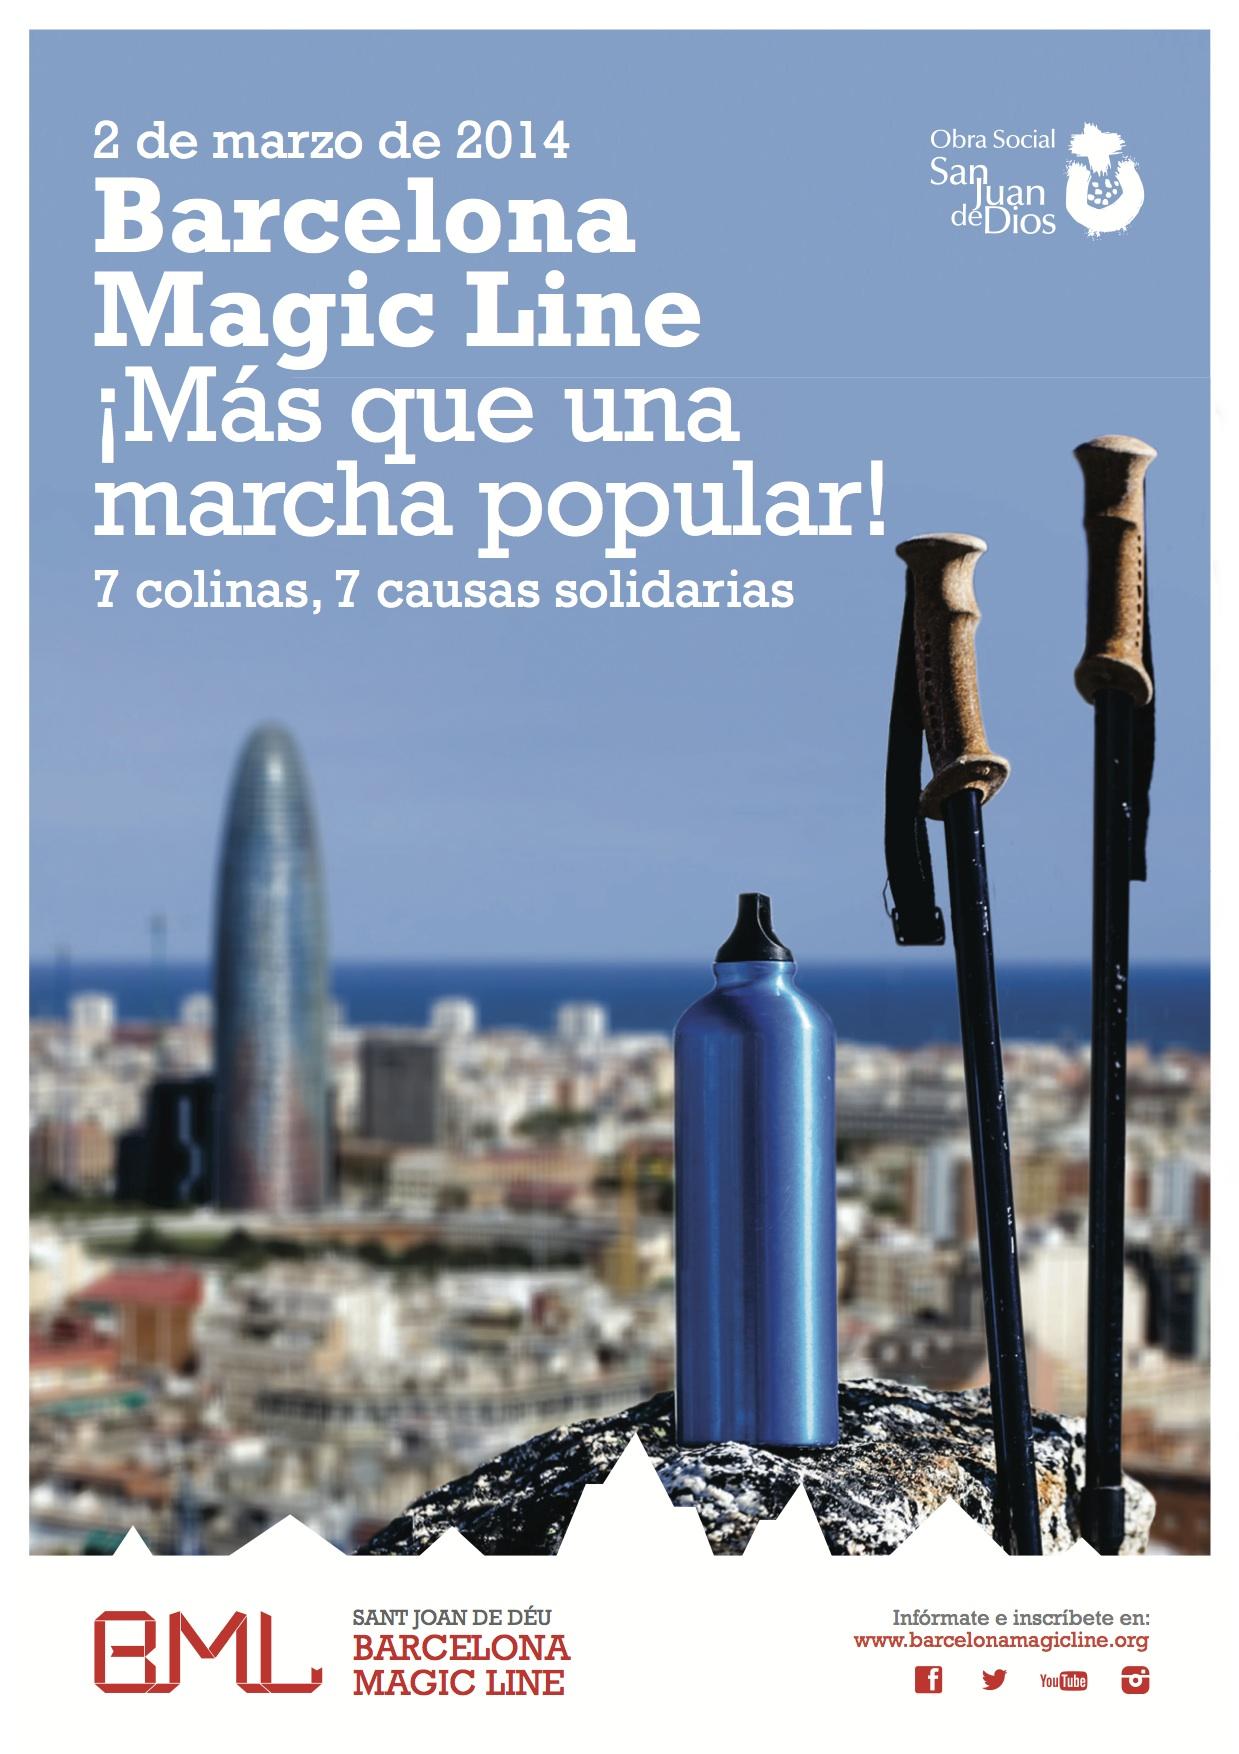 Barcelona magic line elpiscolabis for Haces falta trabajo barcelona